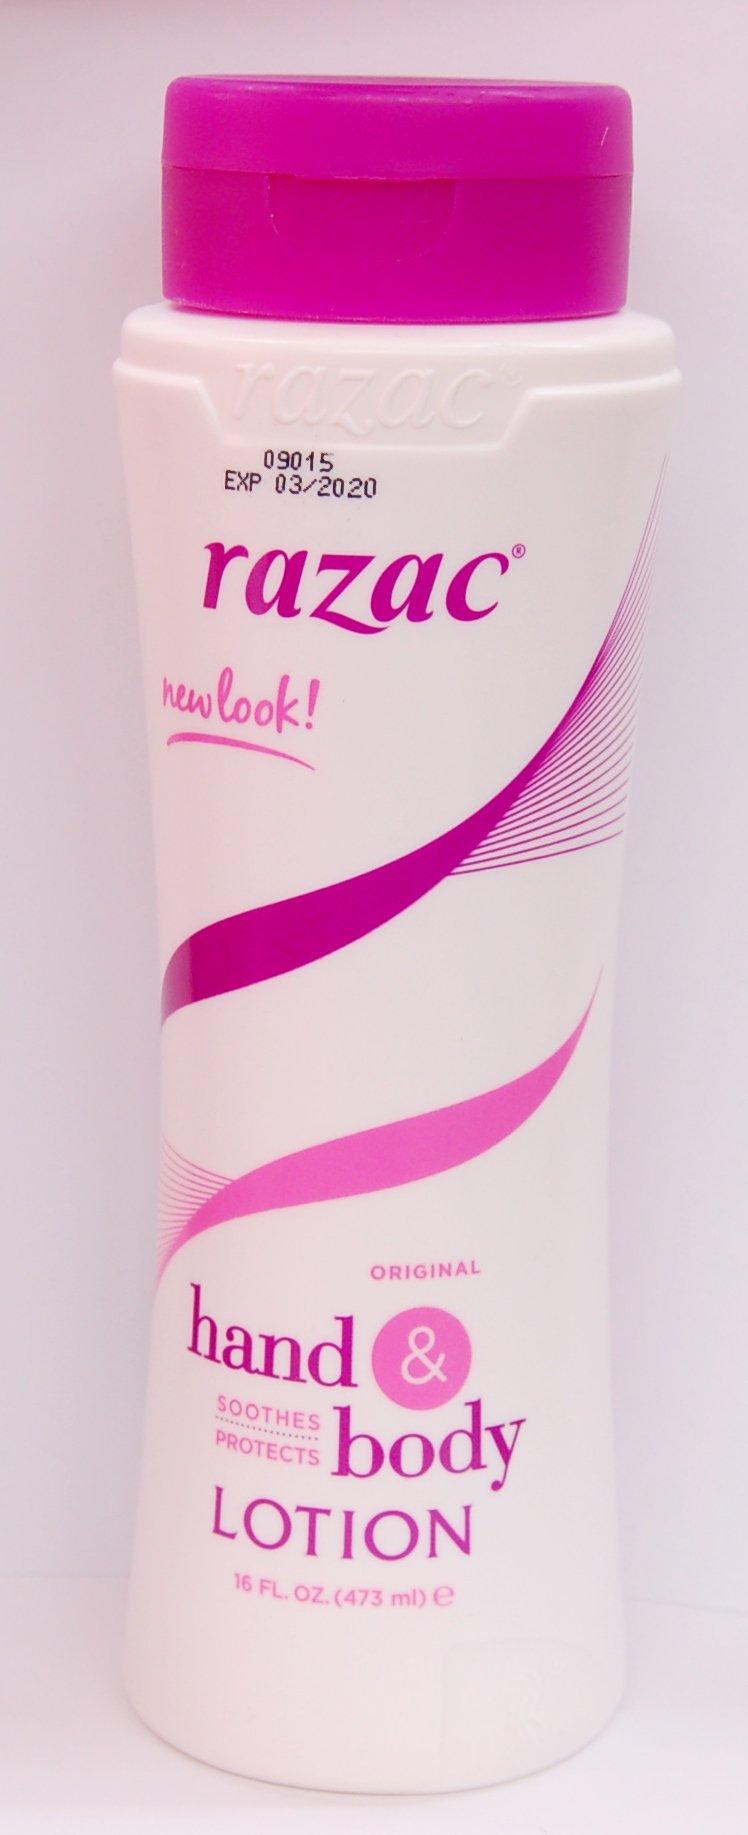 Razac Hand & Body Lotion 16oz (3 Pack)